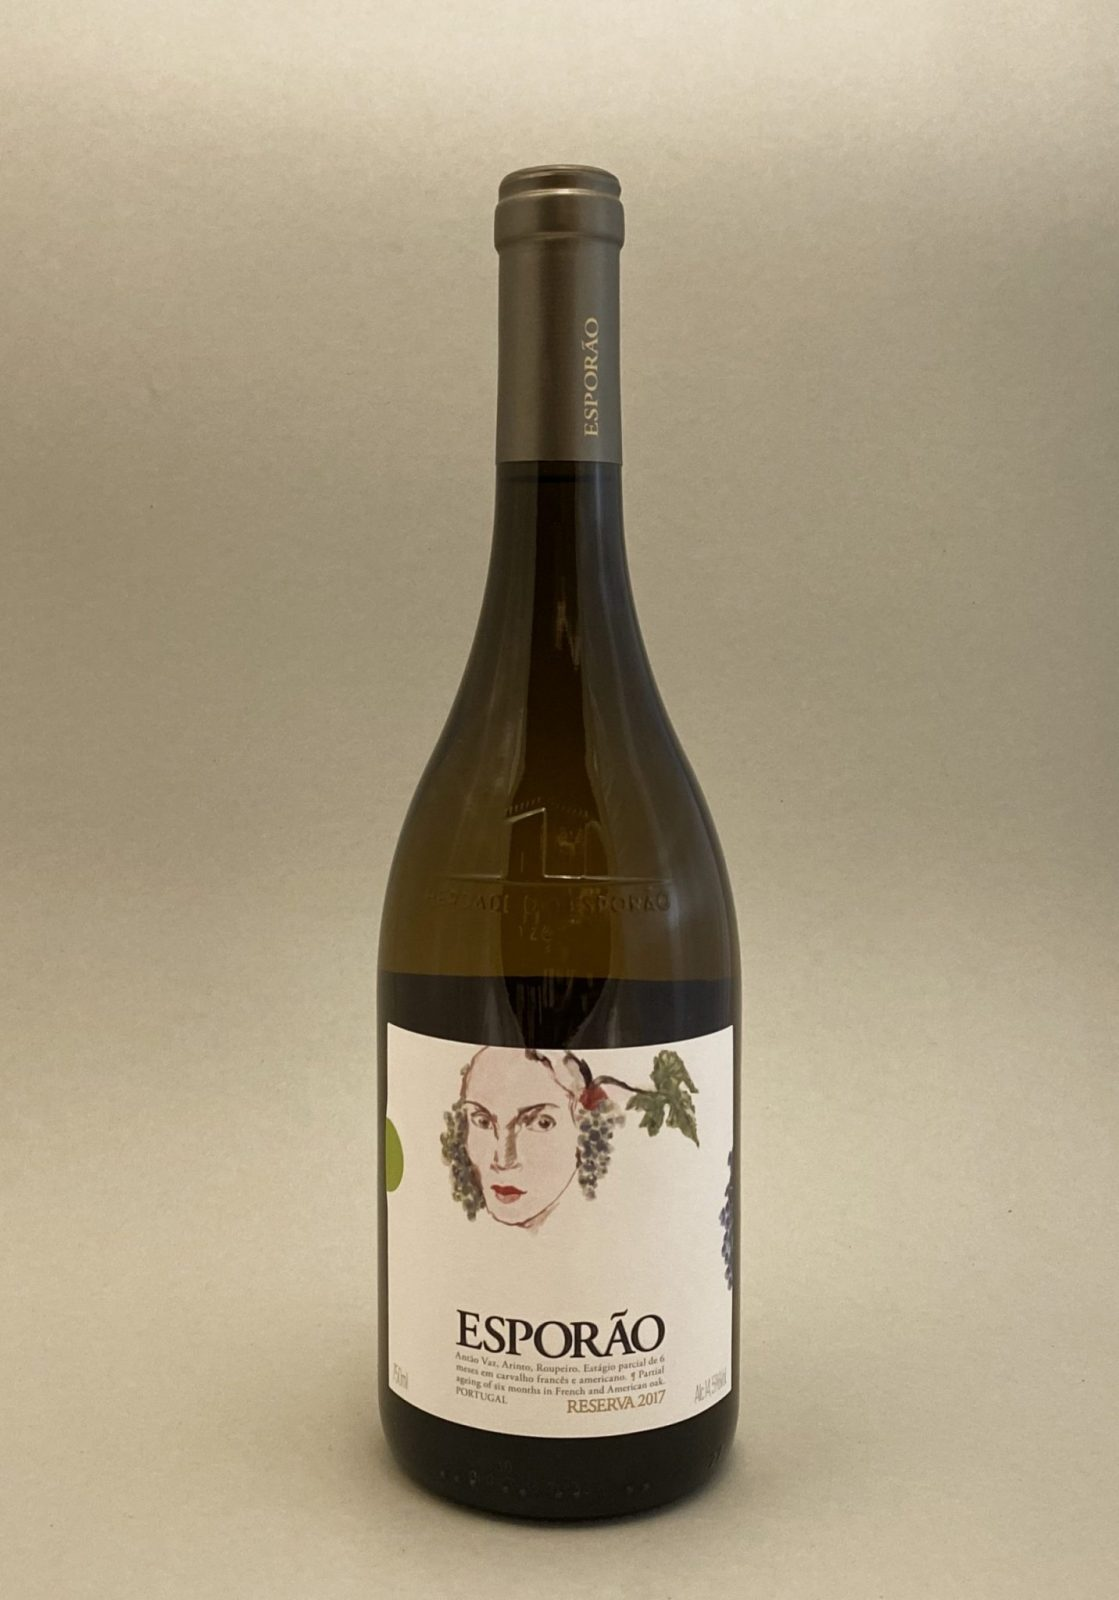 Esporão Reserva 2017, vinoteka Sunny wines slnecnice mesto Bratislava, petrzalka, vino biele z Portugalska